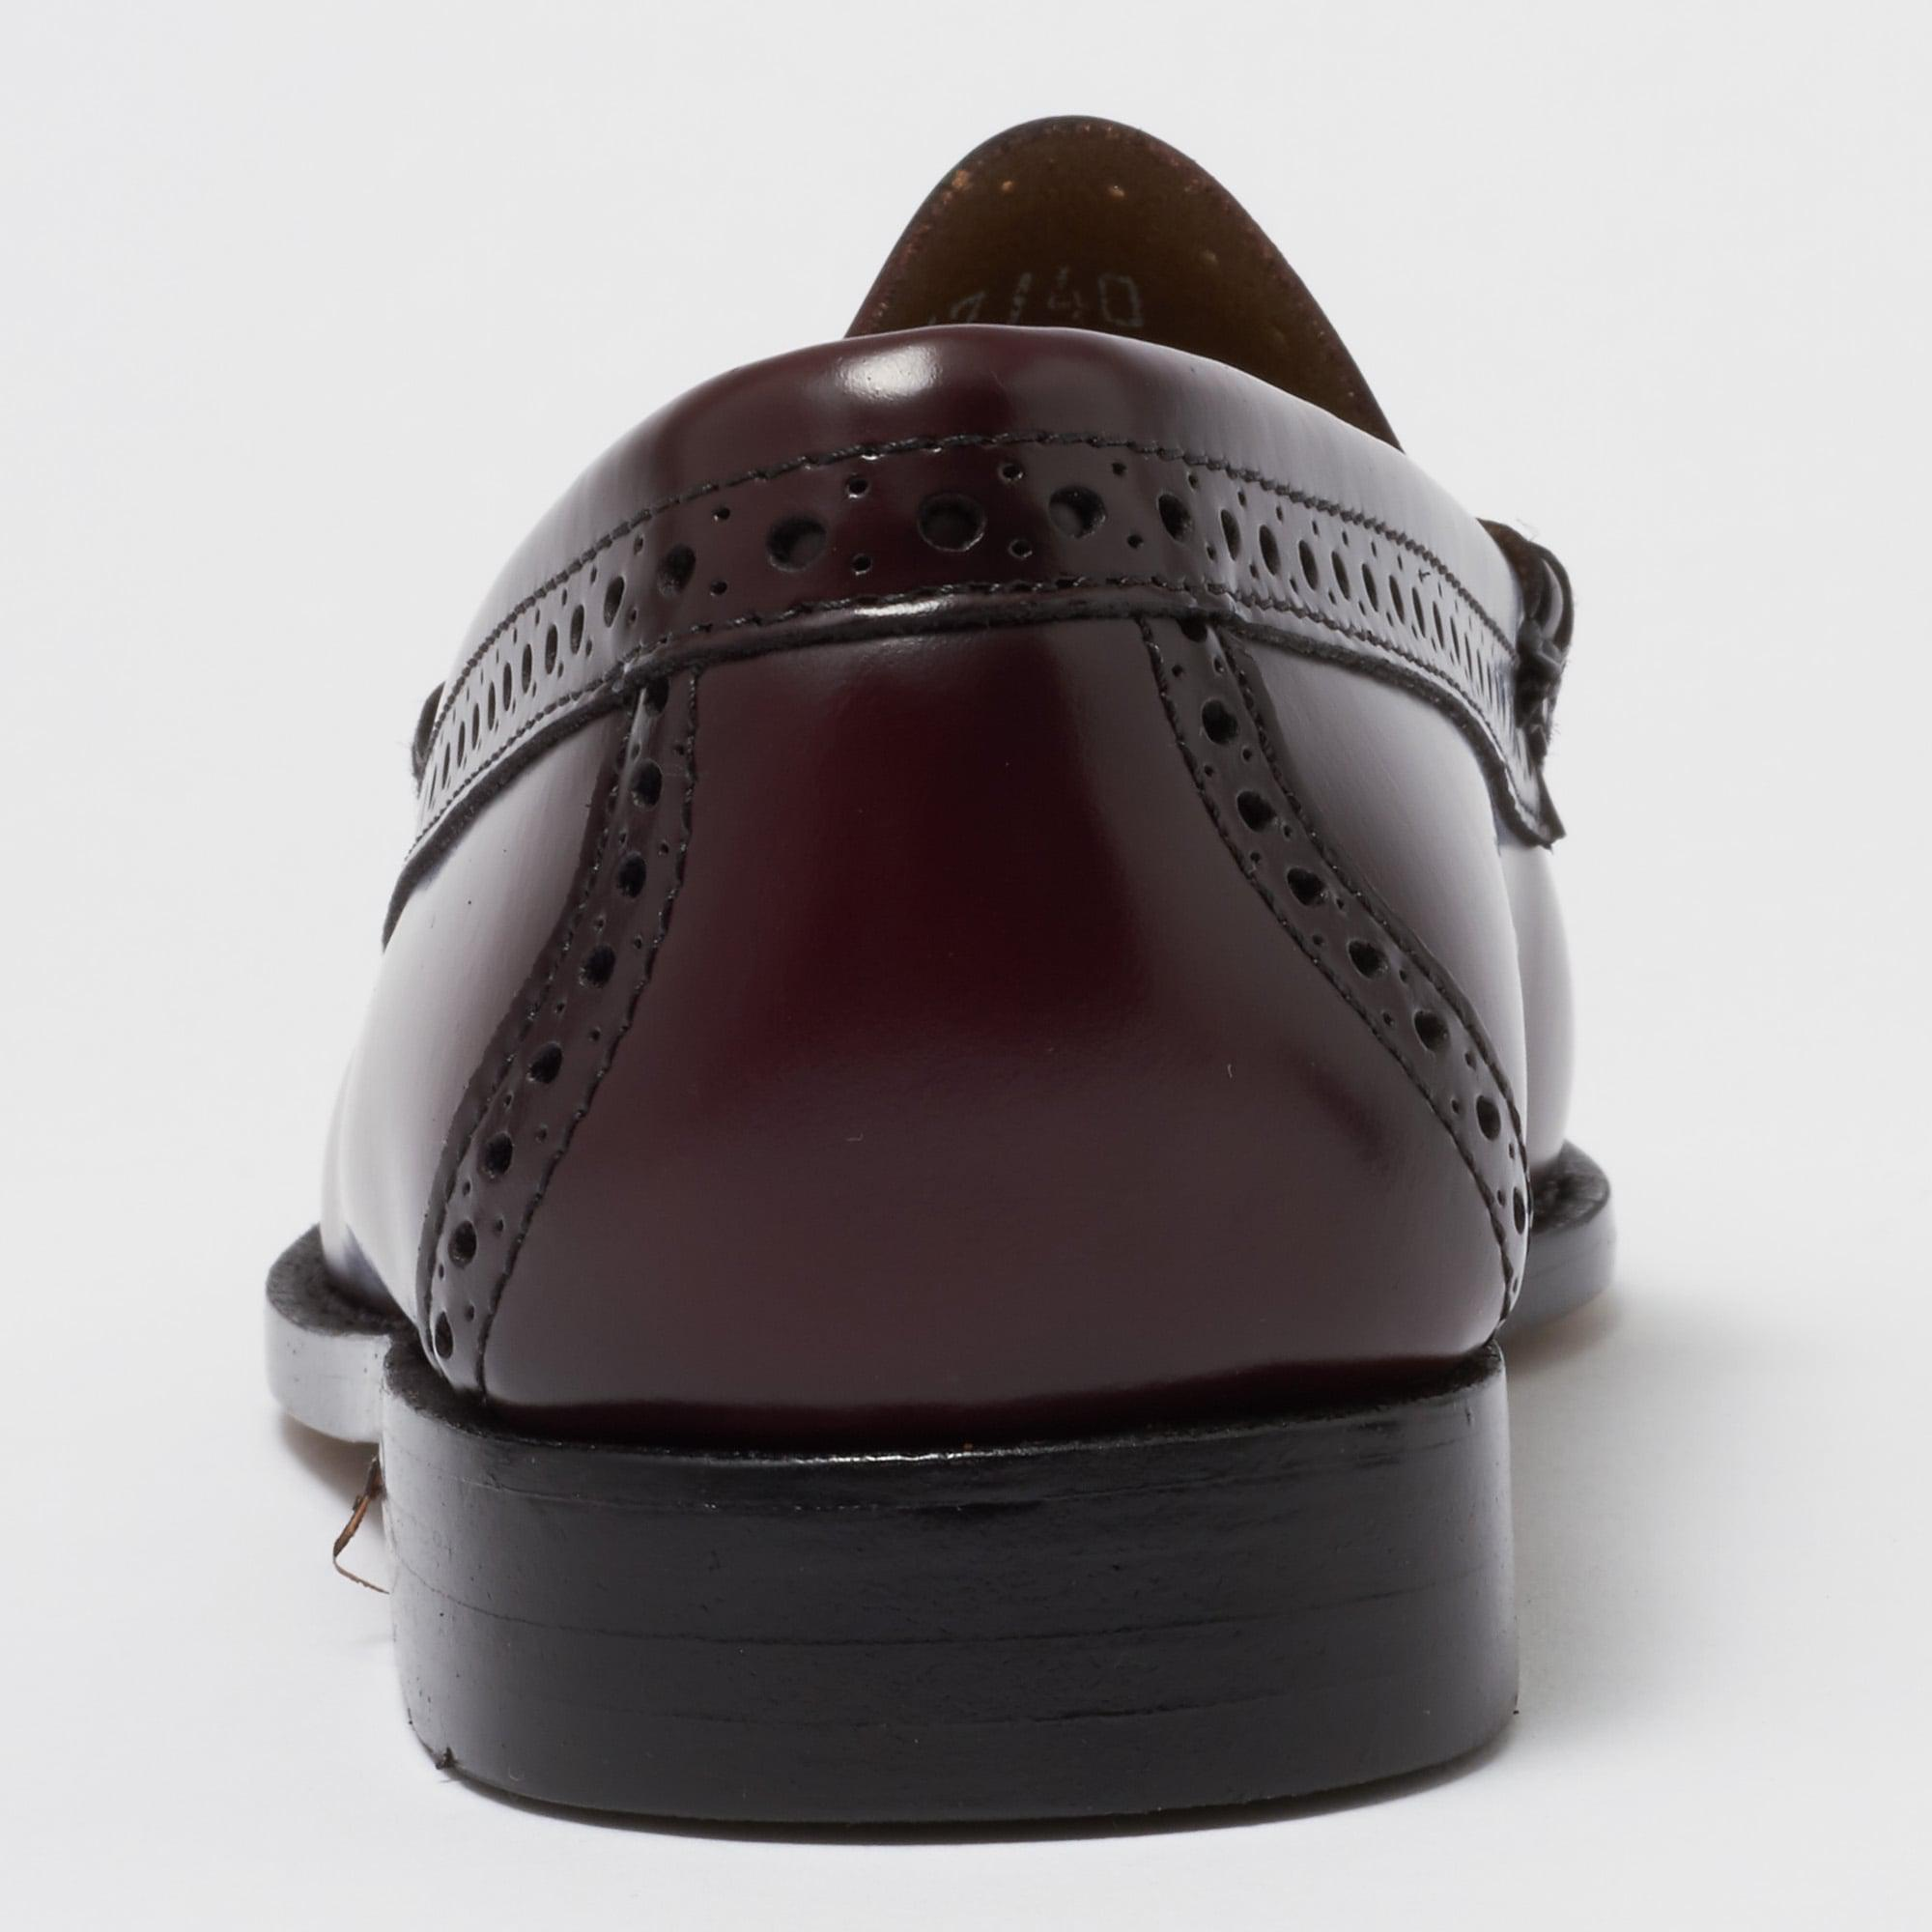 G.H.BASS Leather Larkin Brogue Tassel Loafers - Wine in Brown for Men